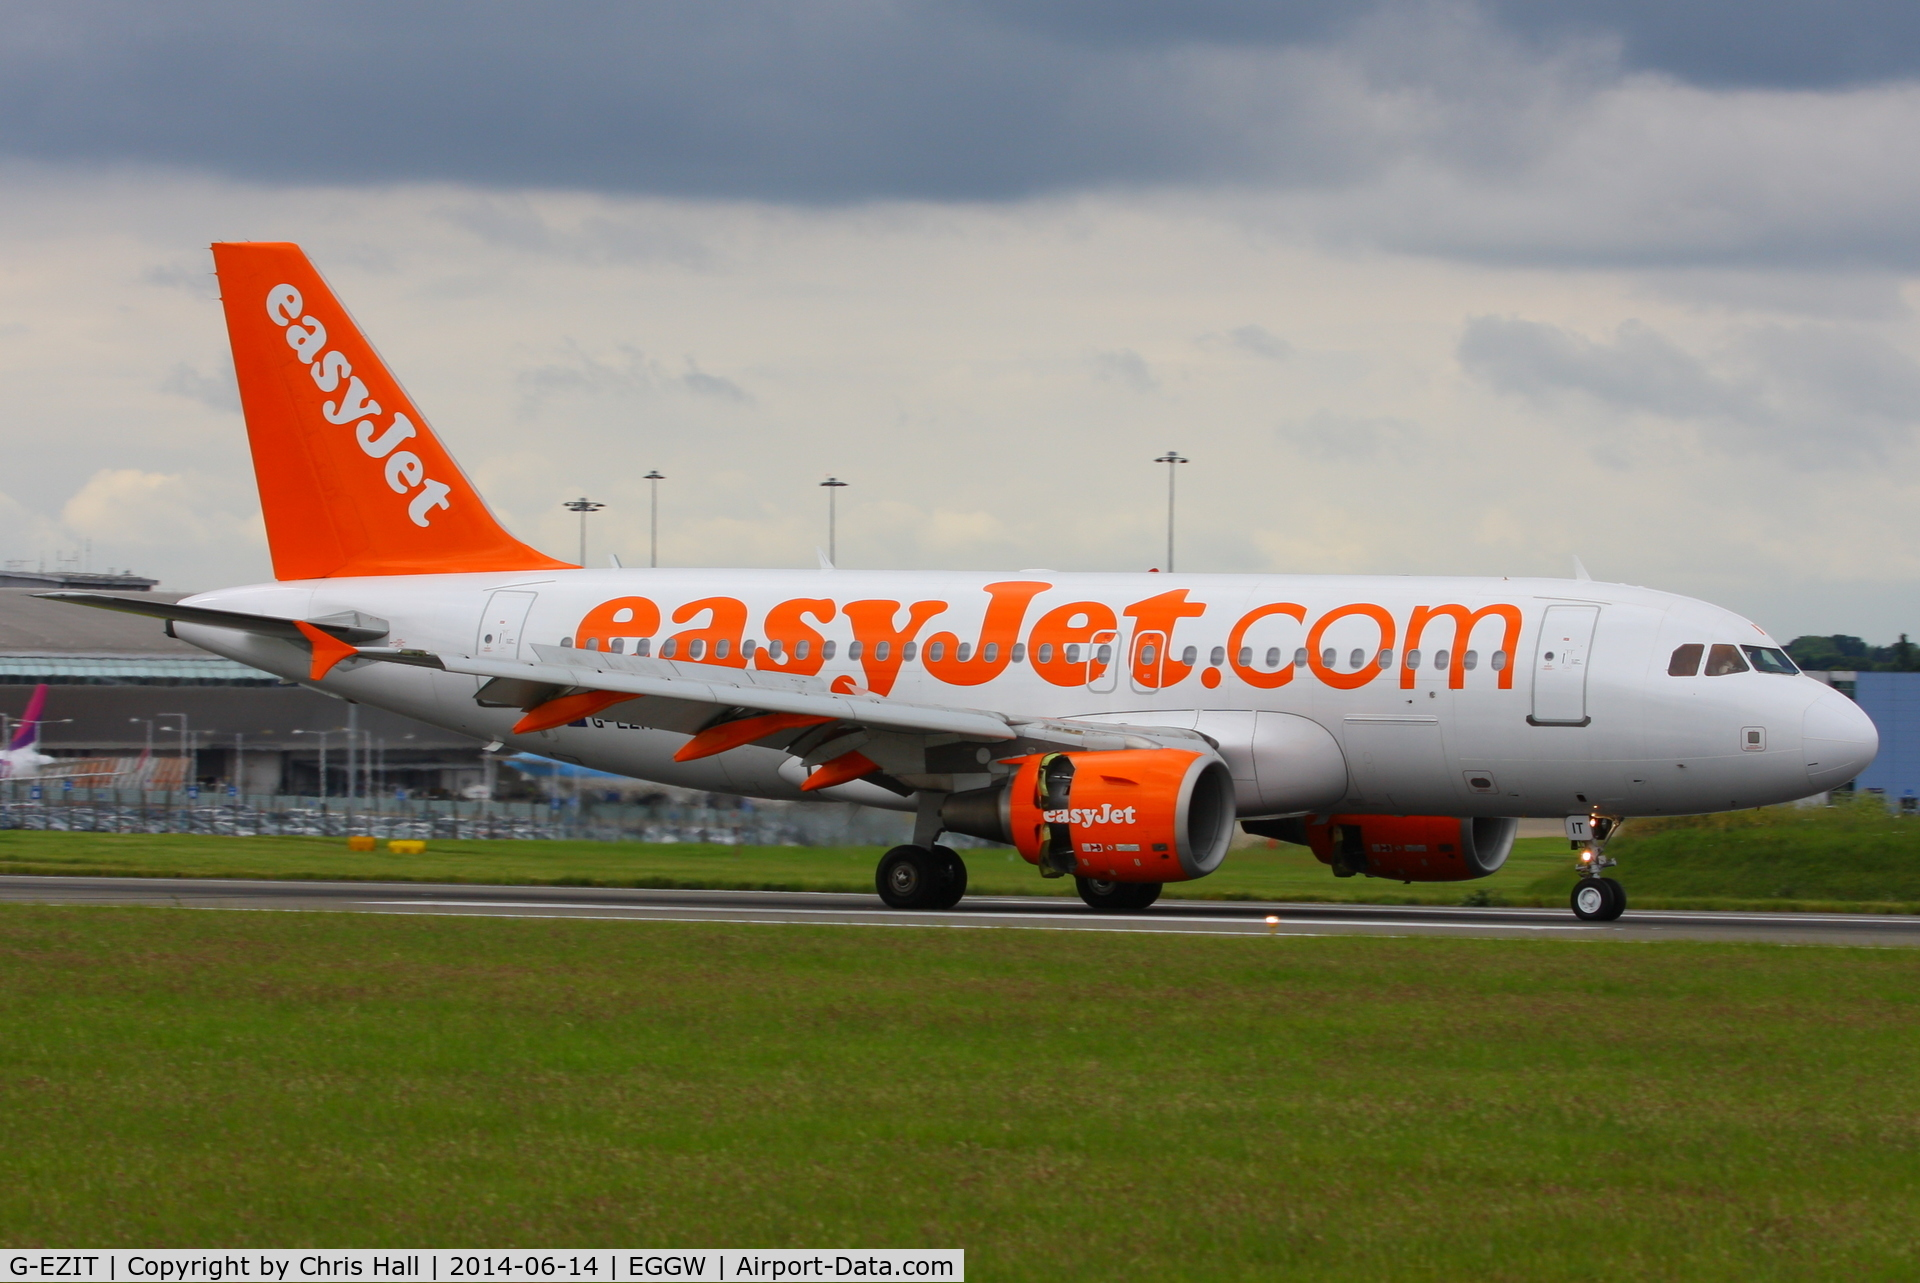 G-EZIT, 2005 Airbus A319-111 C/N 2538, easyJet